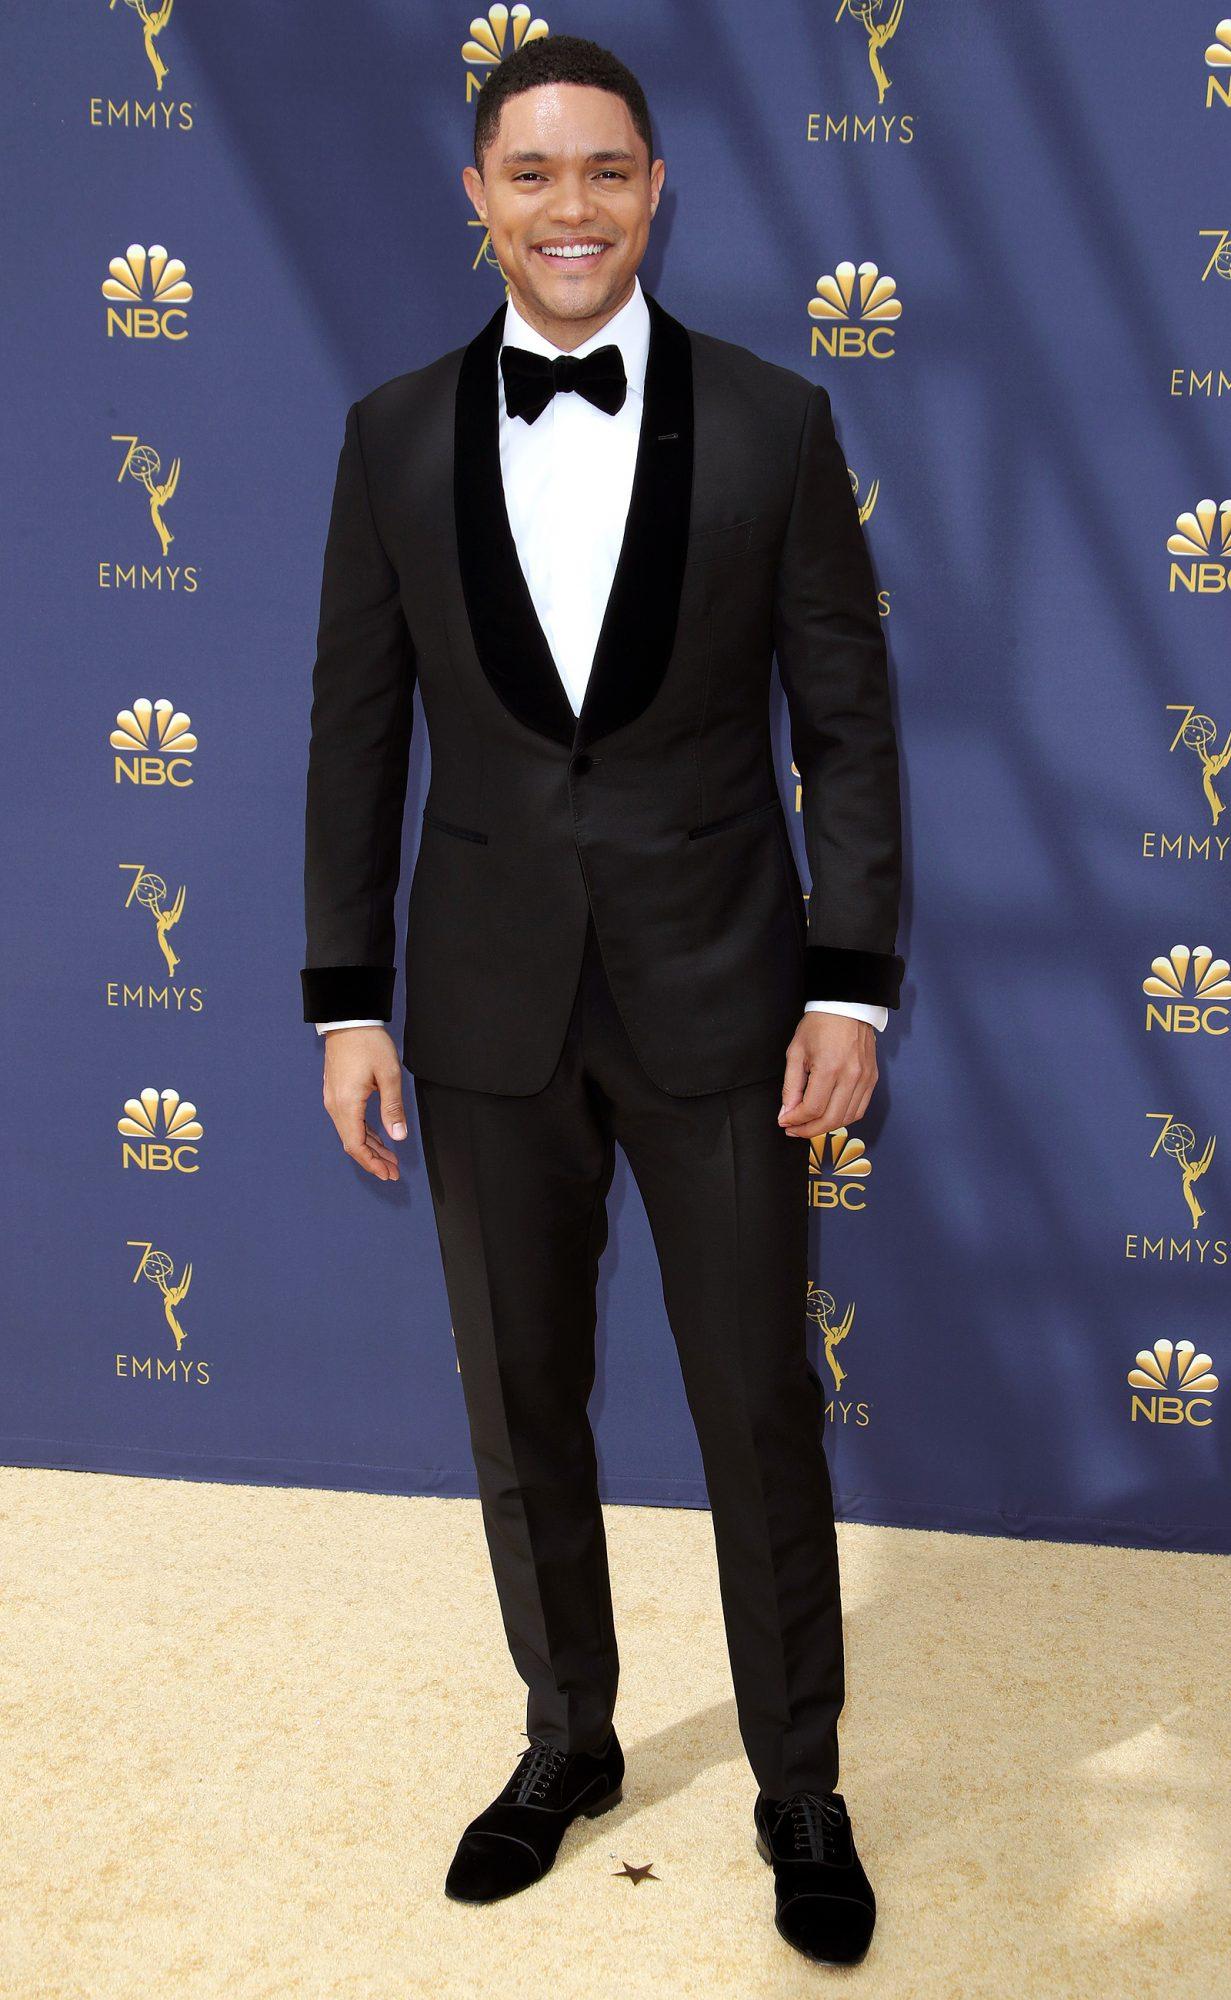 70th Primetime Emmy Awards, Arrivals, Los Angeles, USA - 17 Sep 2018